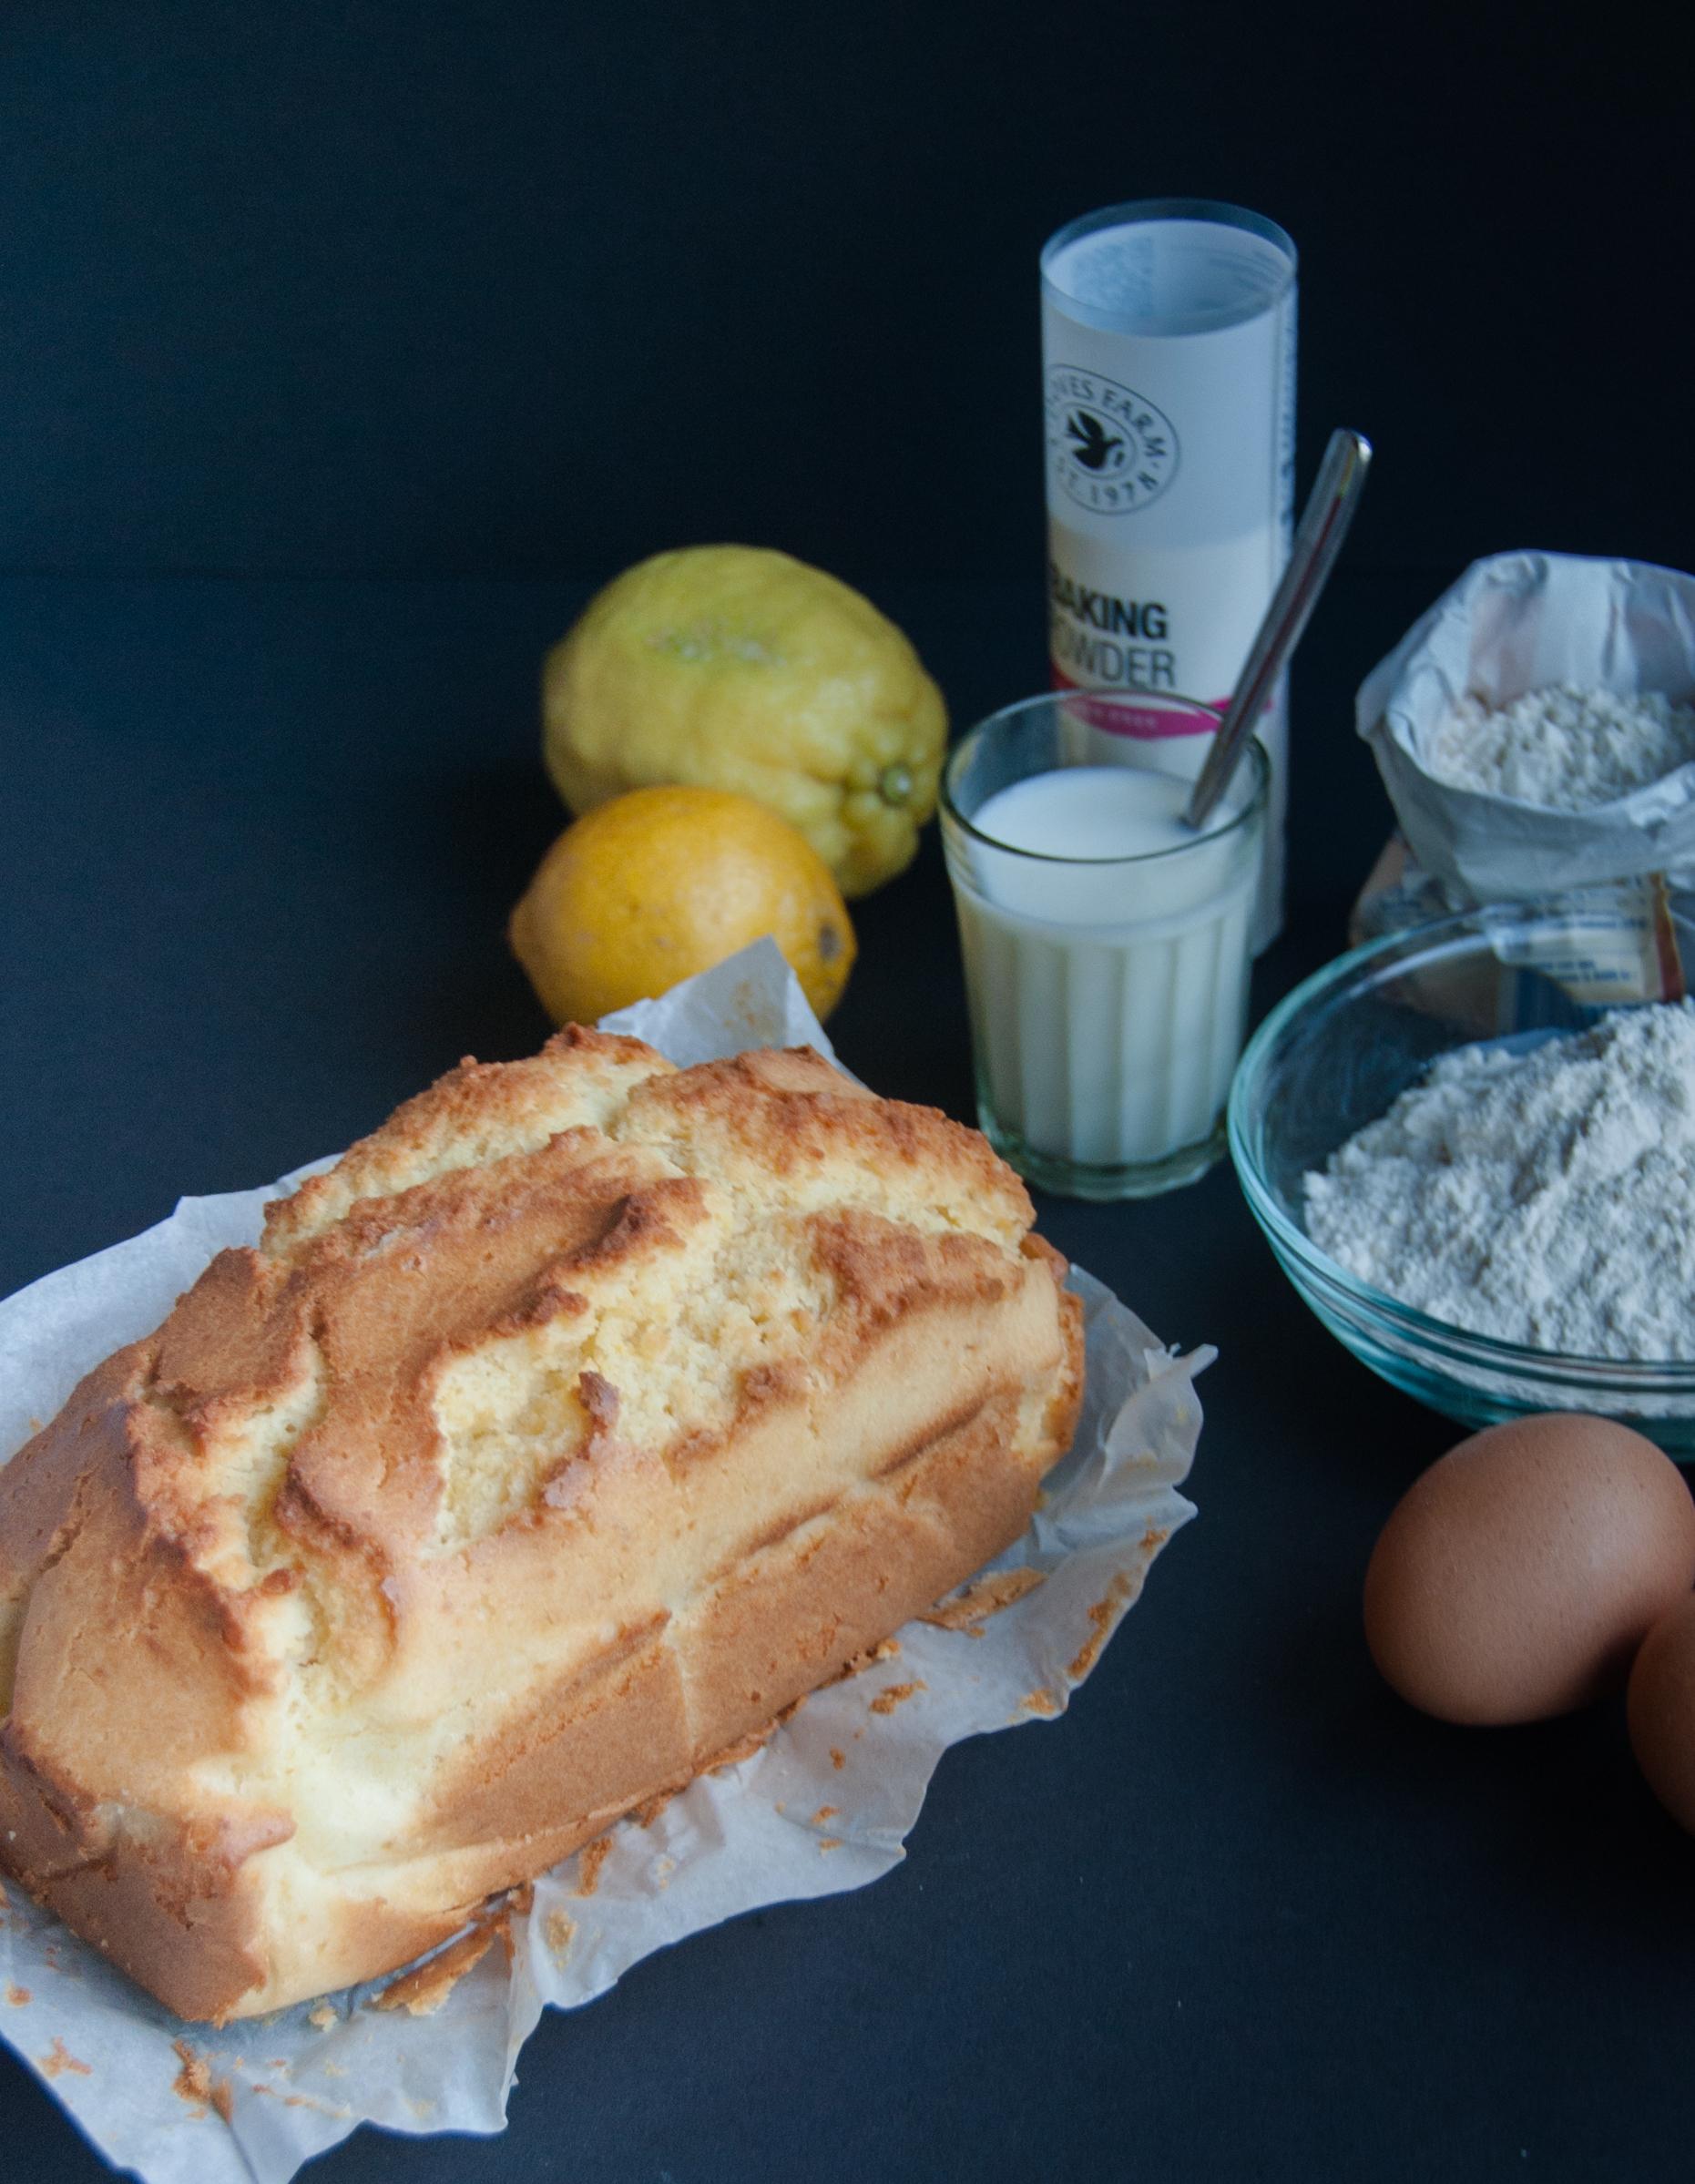 Quick and easy weekday lemon cake